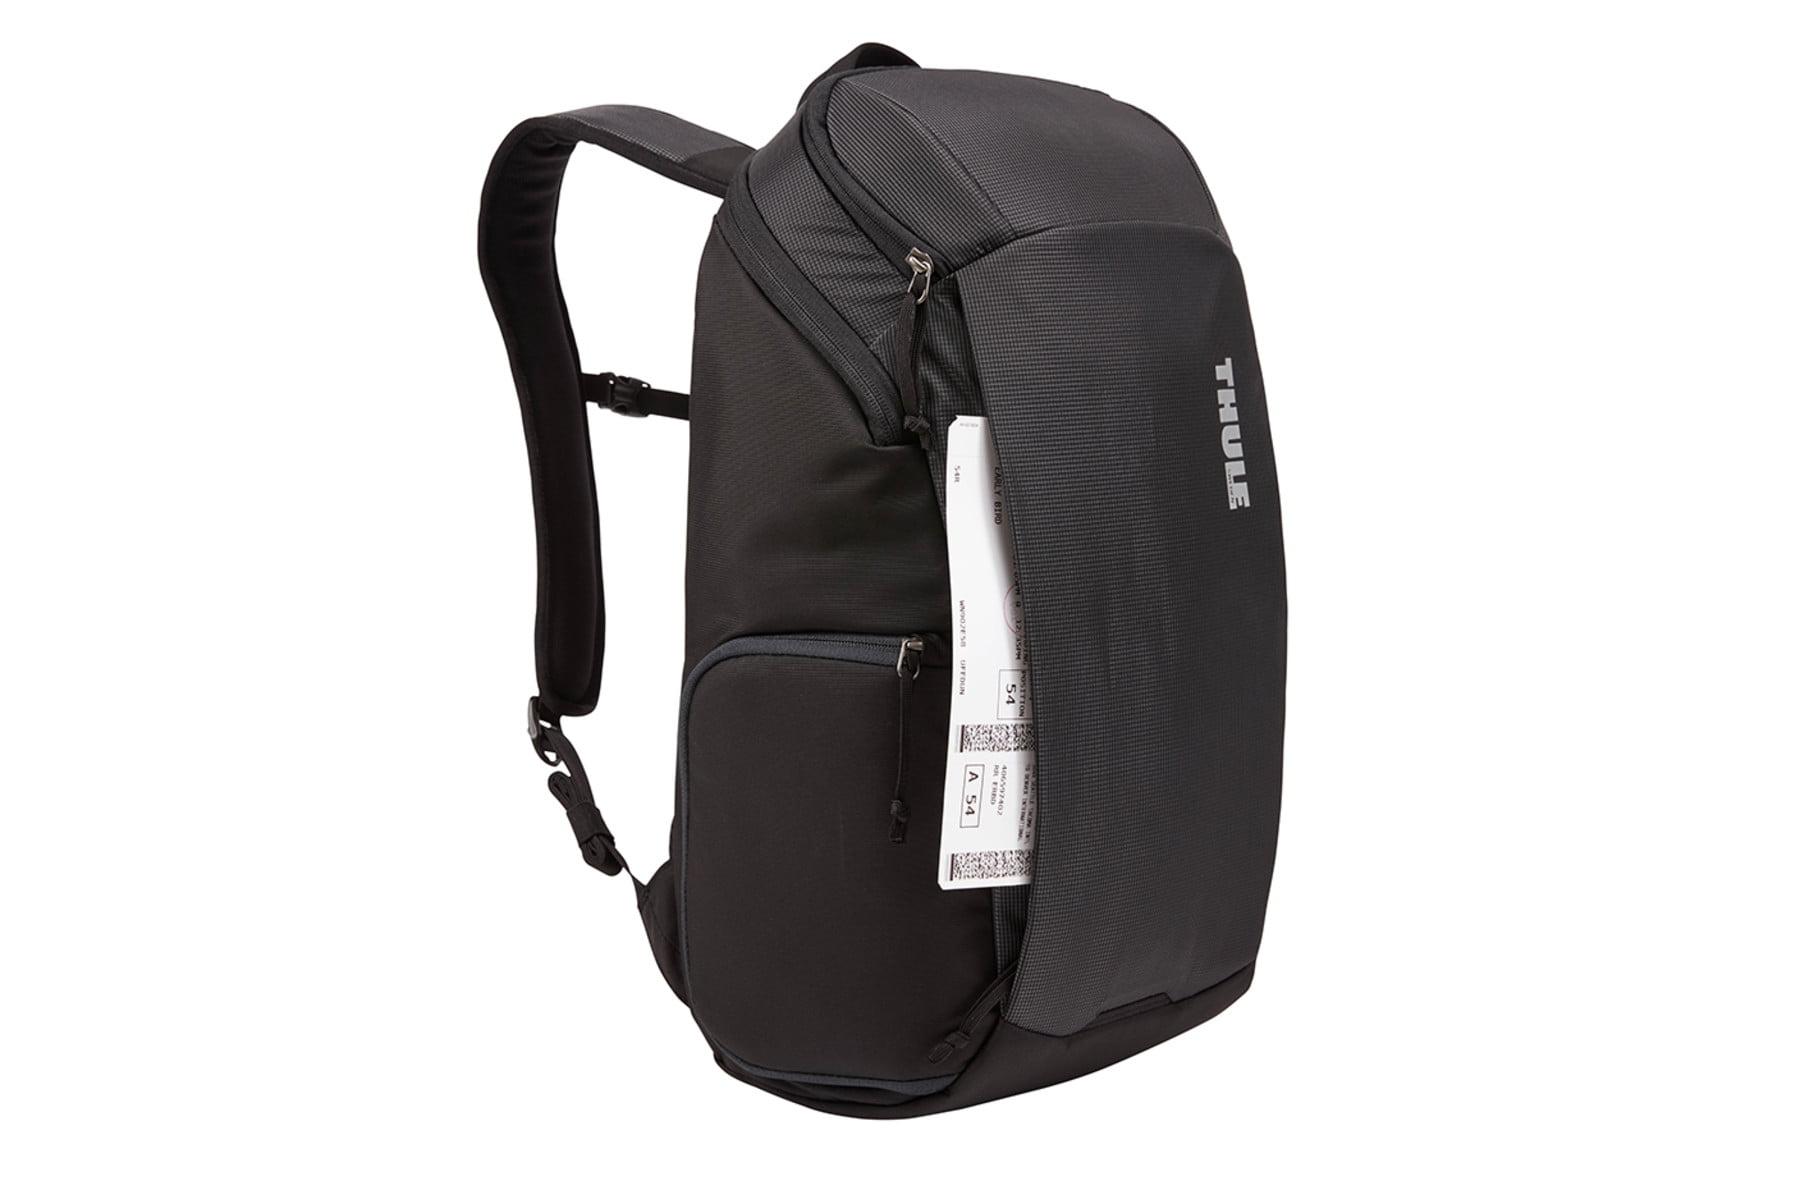 Rucsac foto Thule Enroute Camera Backpack 20L 10